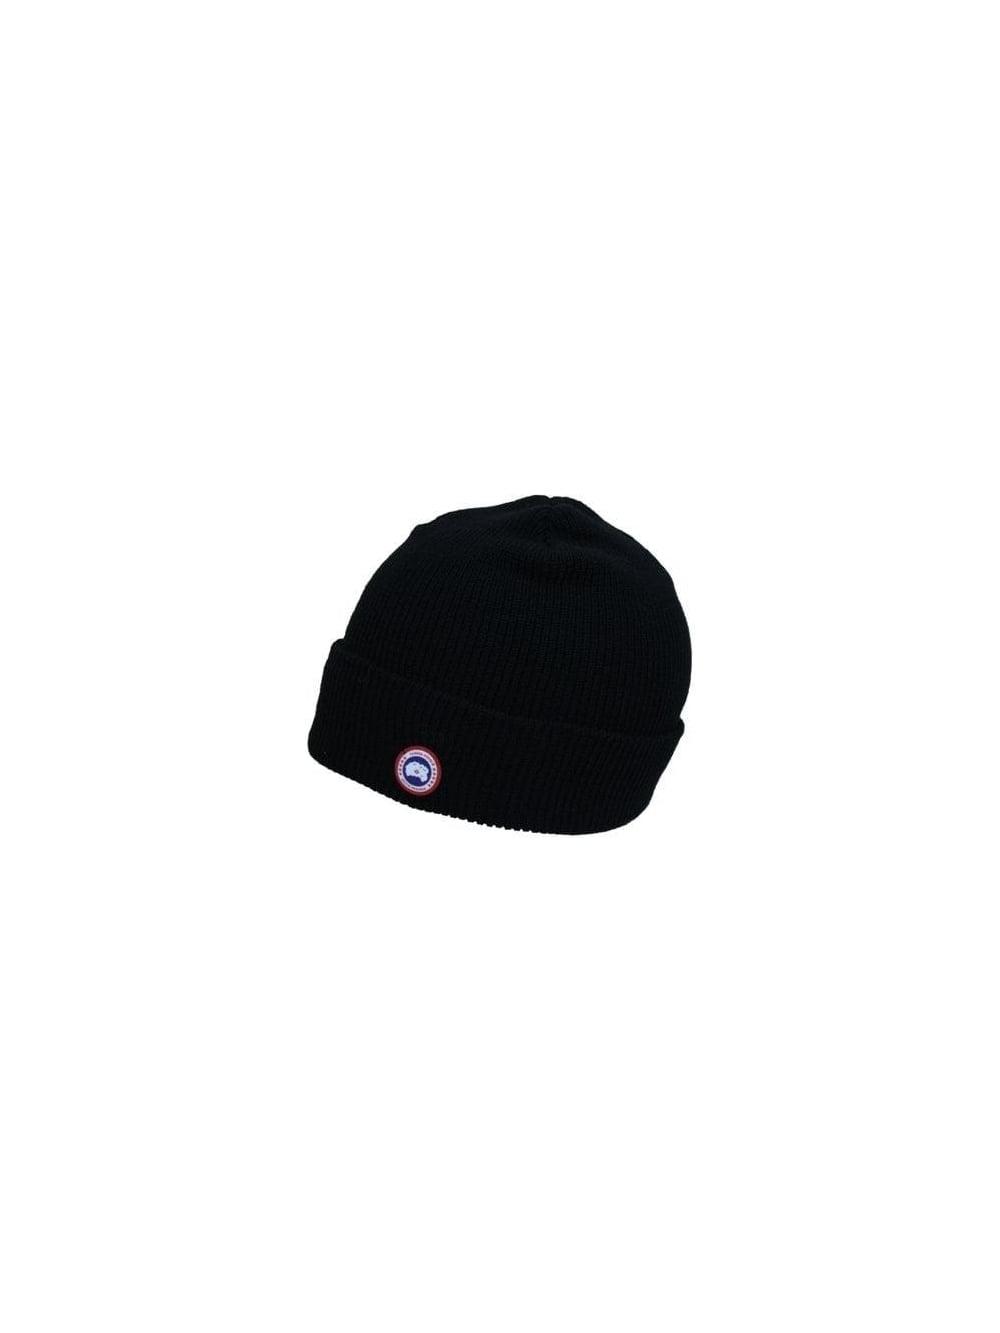 Canada Goose Merino Wool Watch Hat in Black - Northern Threads 7738573a5b7